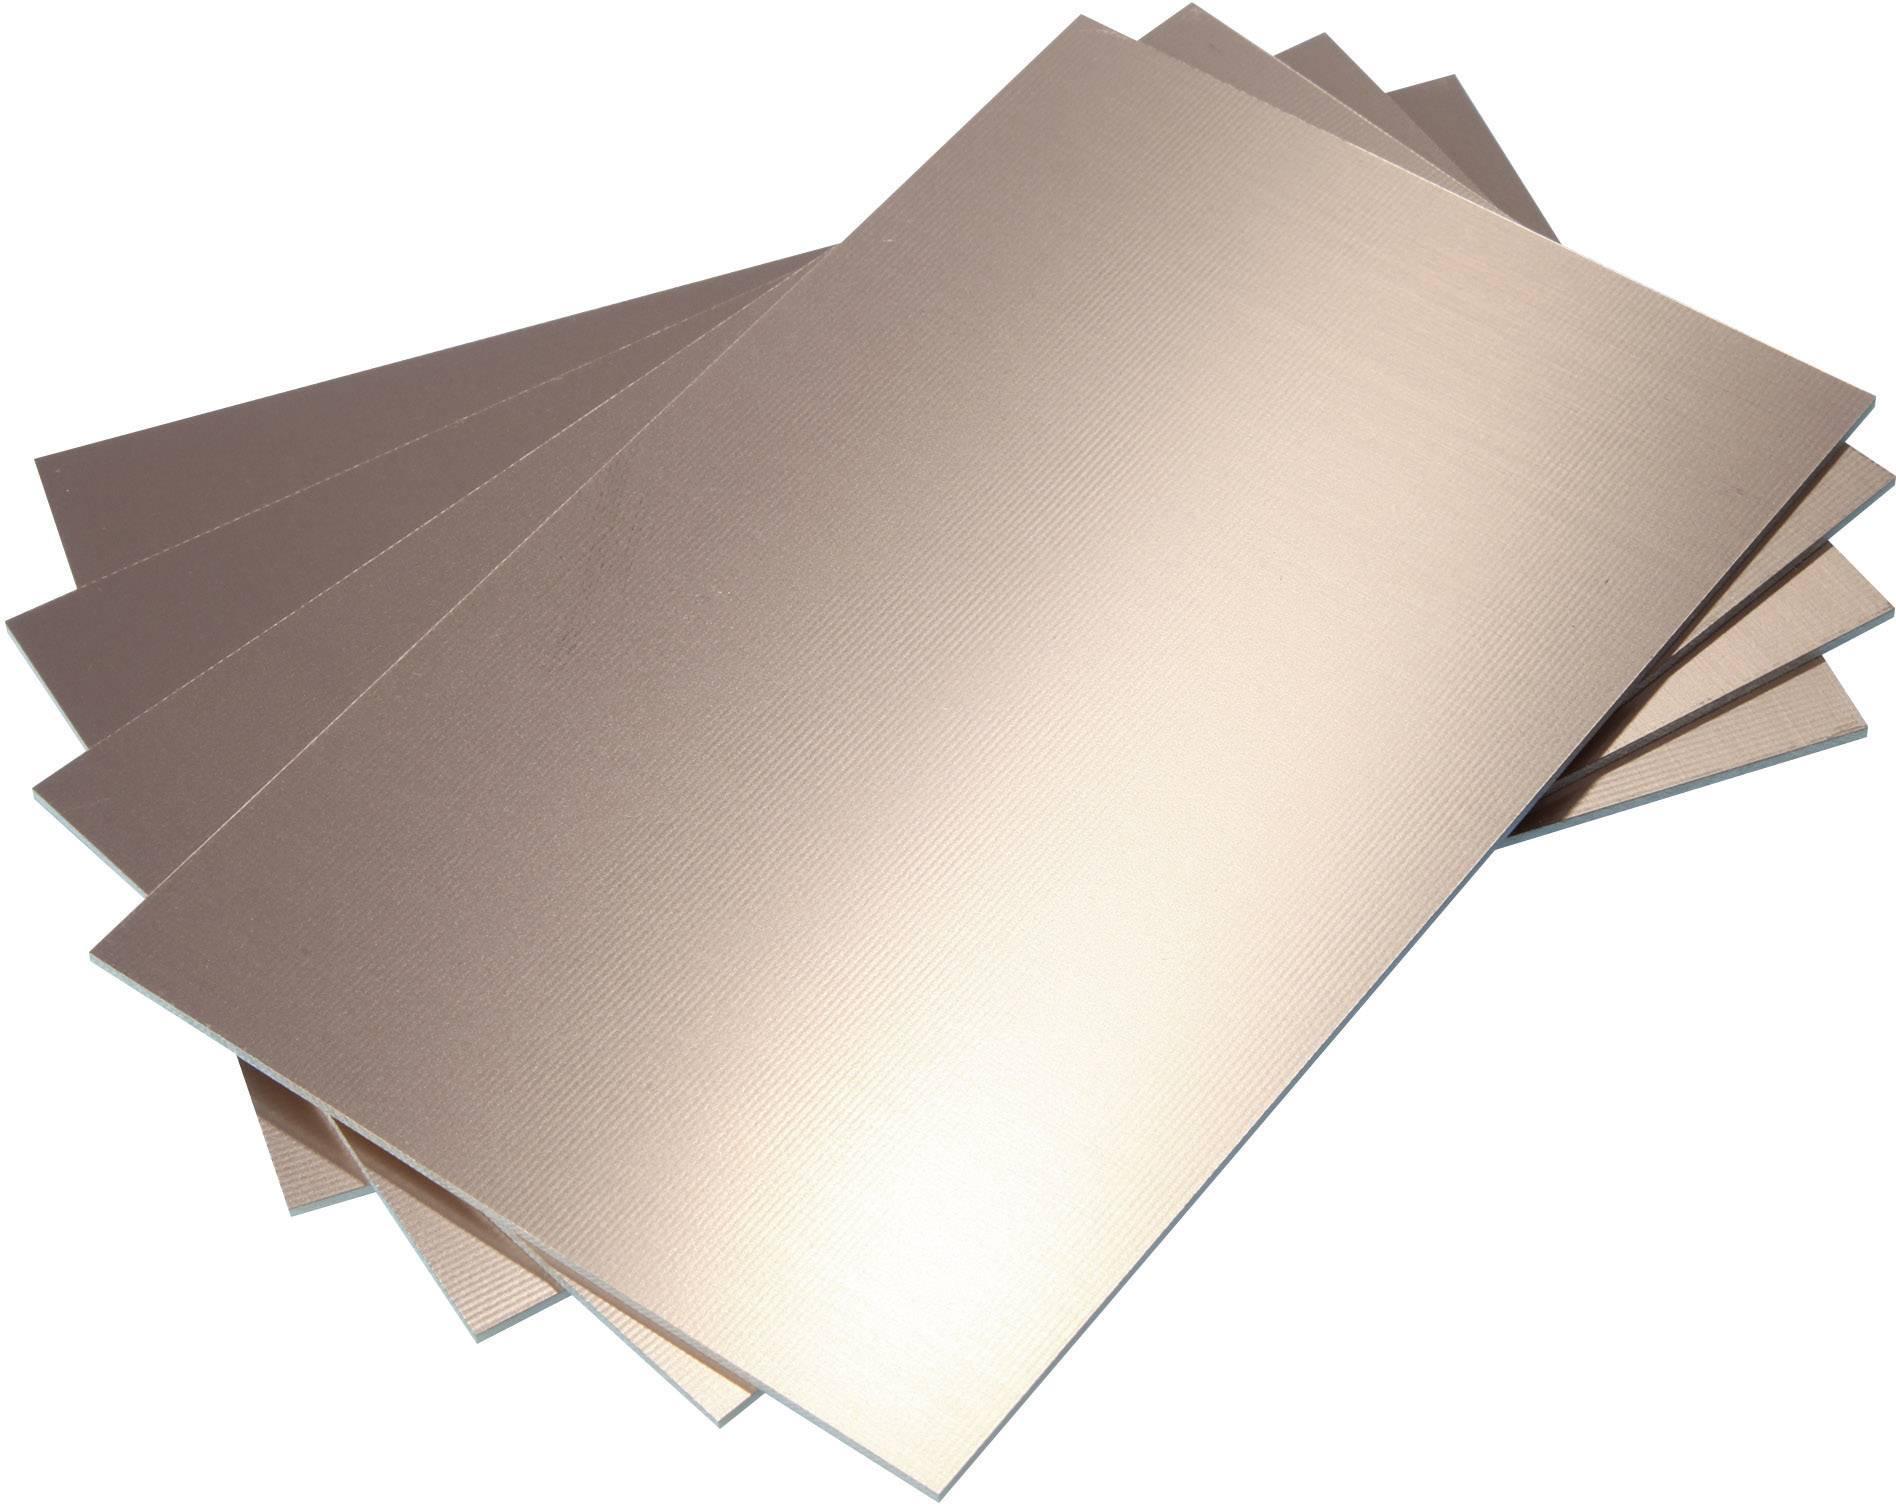 Základný materiál DPS Bungard 020306Z35-50, 35 µm, (d x š) 300 mm x 200 mm